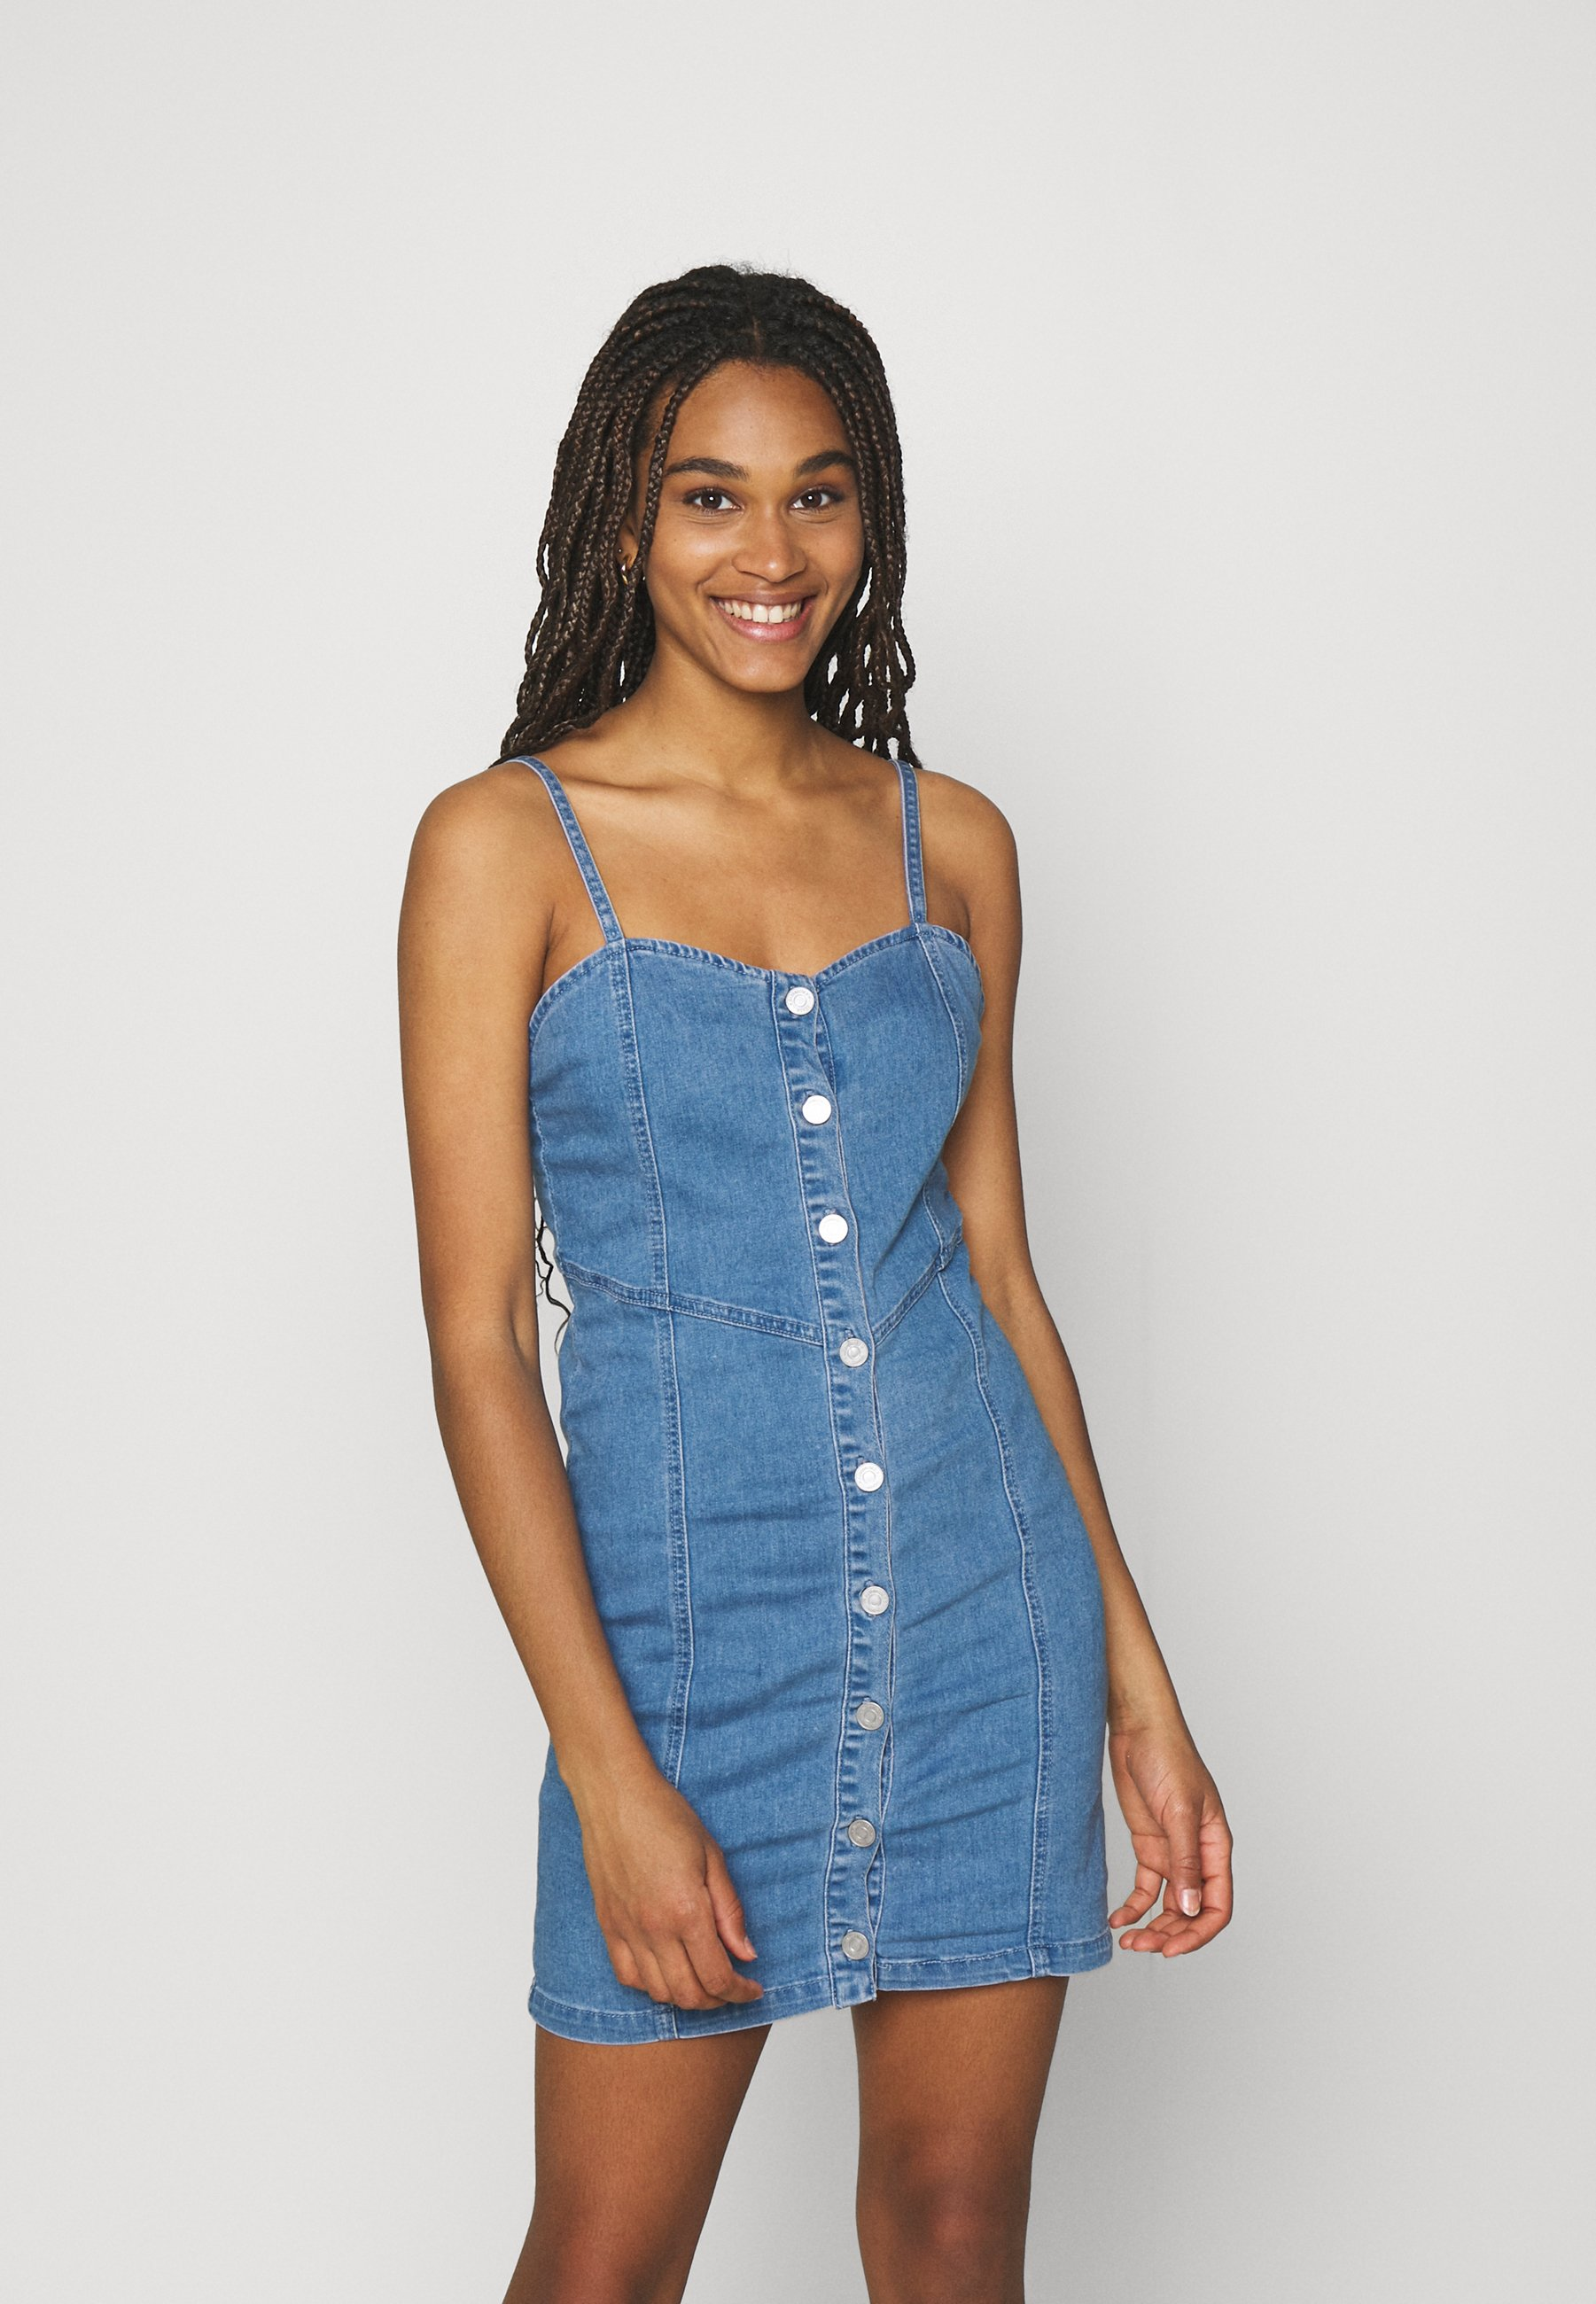 Button Dress,Button Dress,button dress,